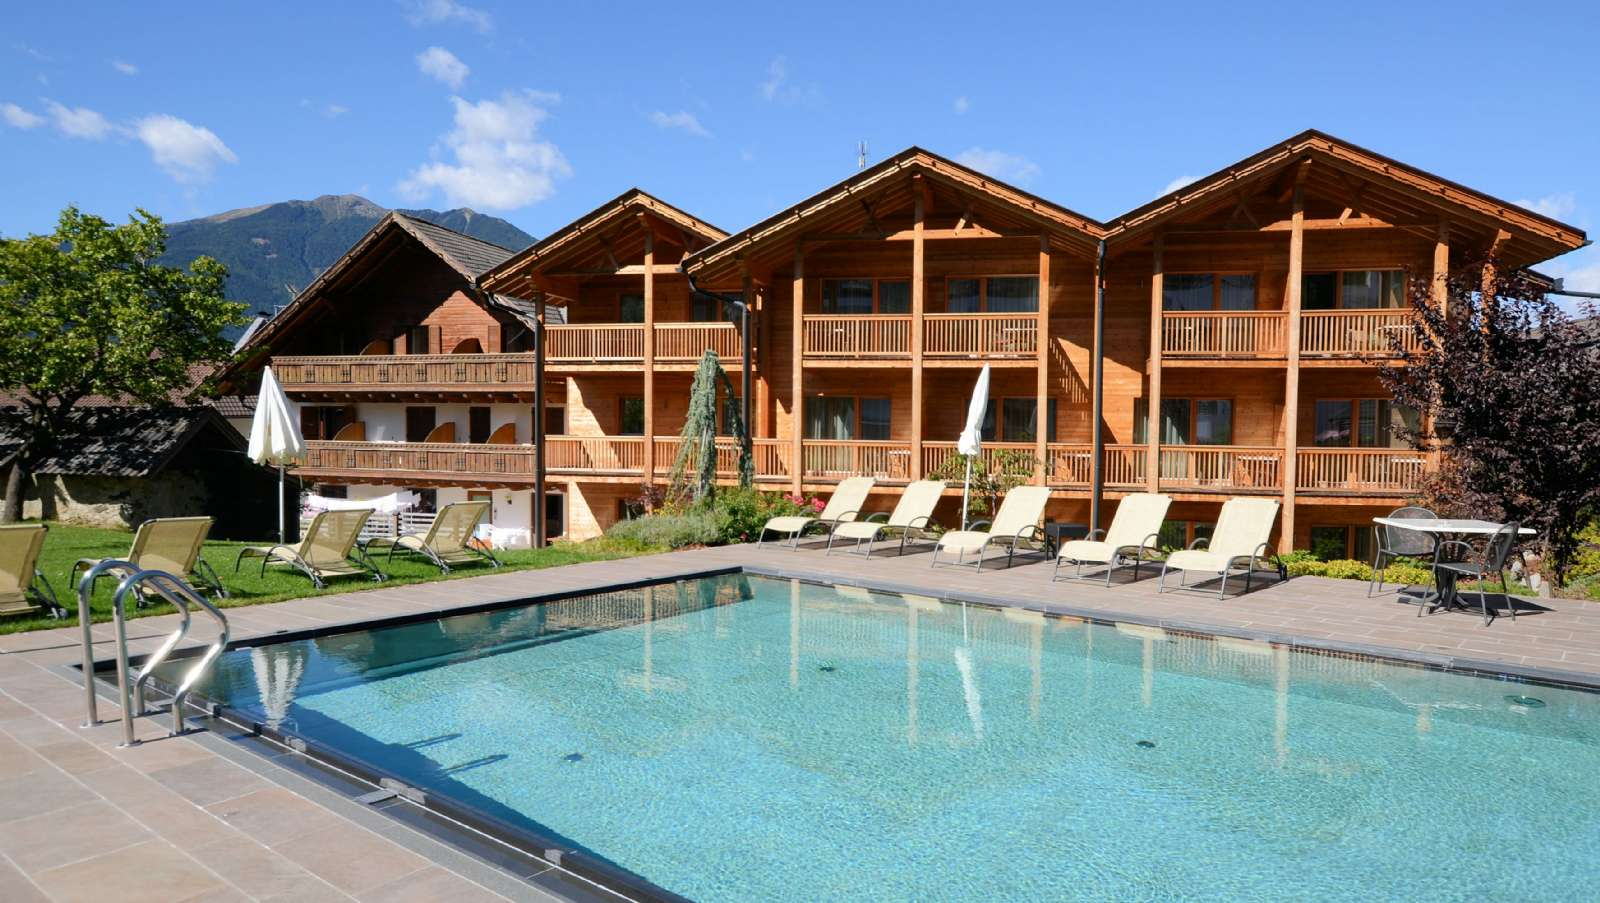 Das Swimmingpool im benachbarten Hotel Gasserhof